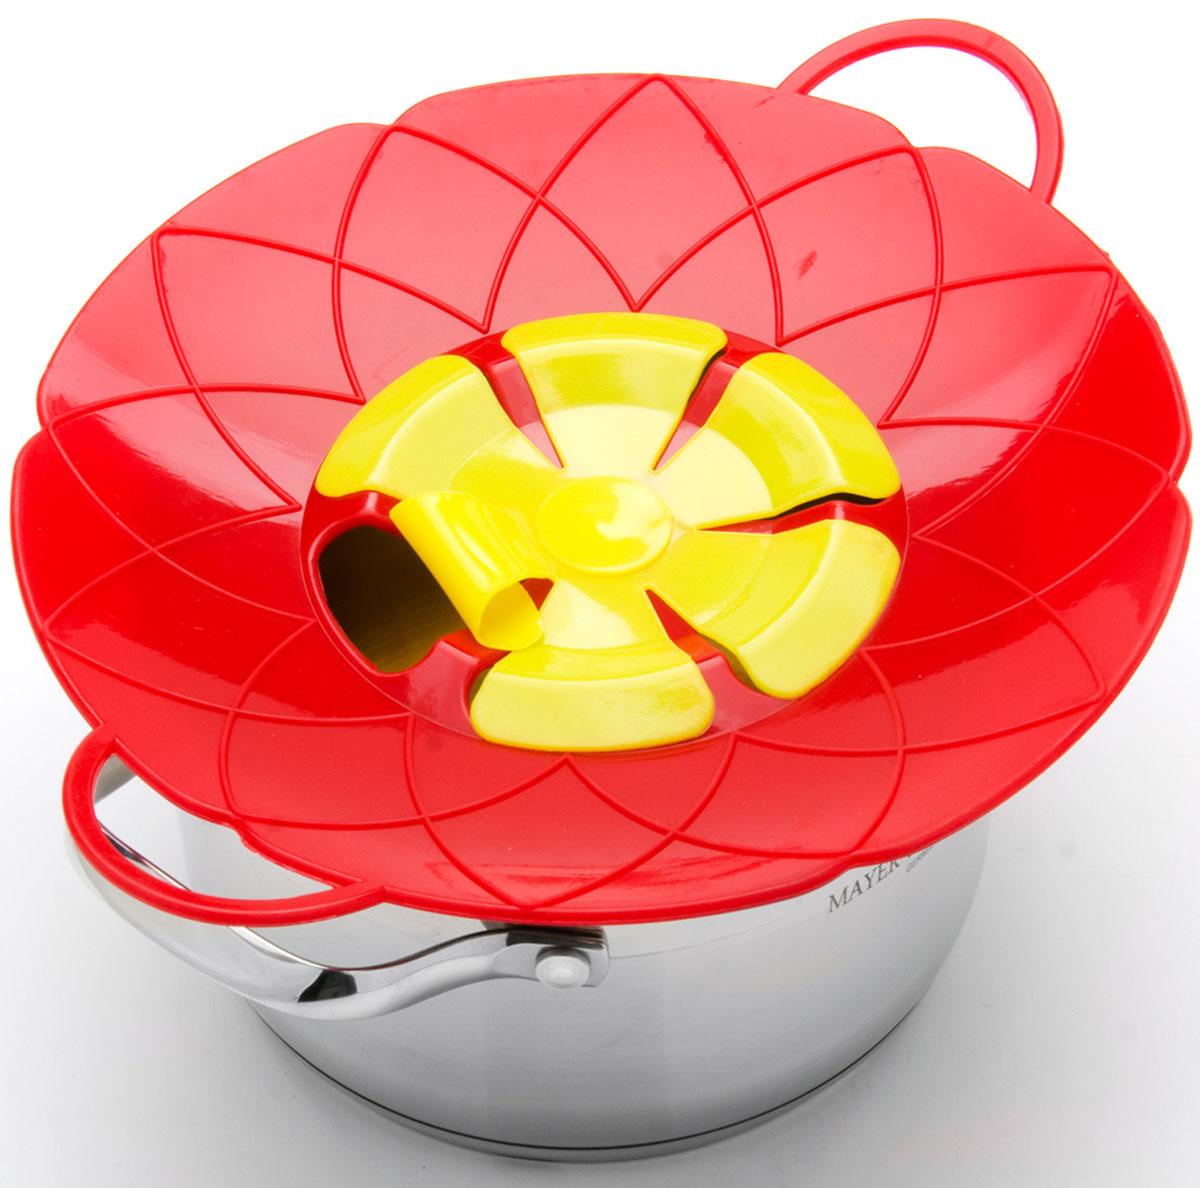 "Крышка-невыкипайка ""Mayer & Boch"", цвет: красный, желтый, диаметр 25 см 24256-2"